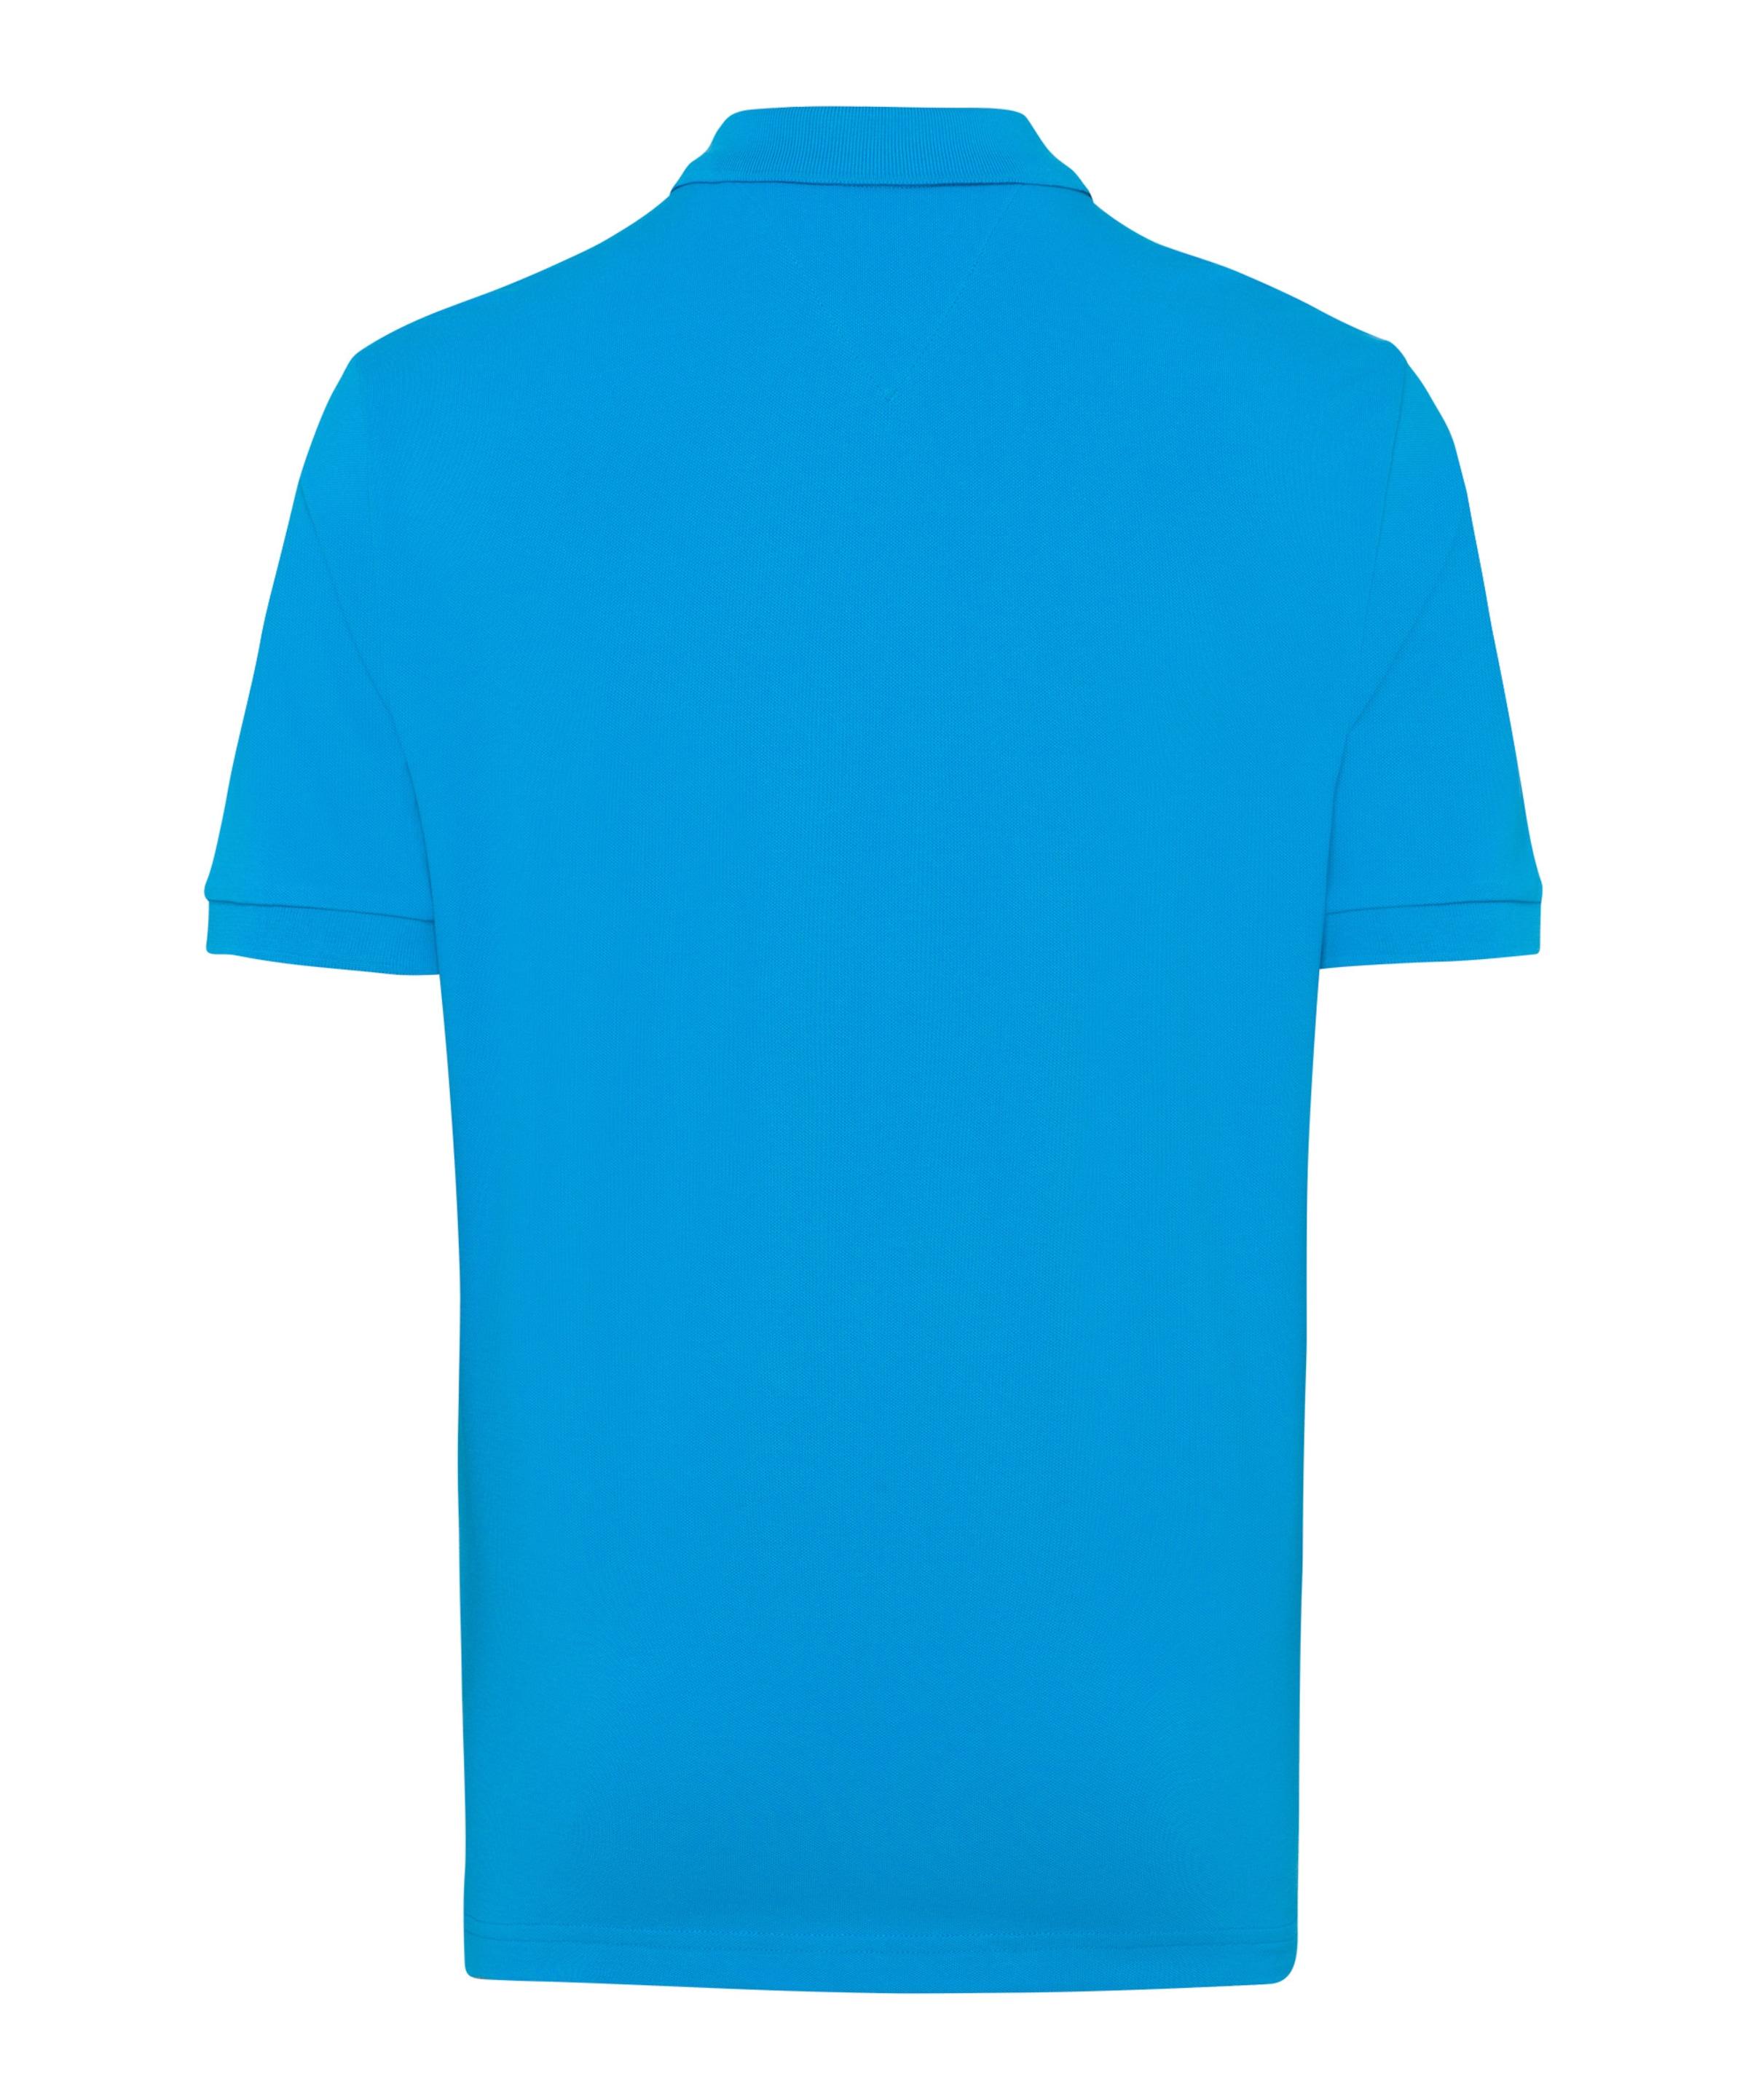 Shirt Brax Himmelblau 'pete' Brax In Shirt UpqMGzSVL